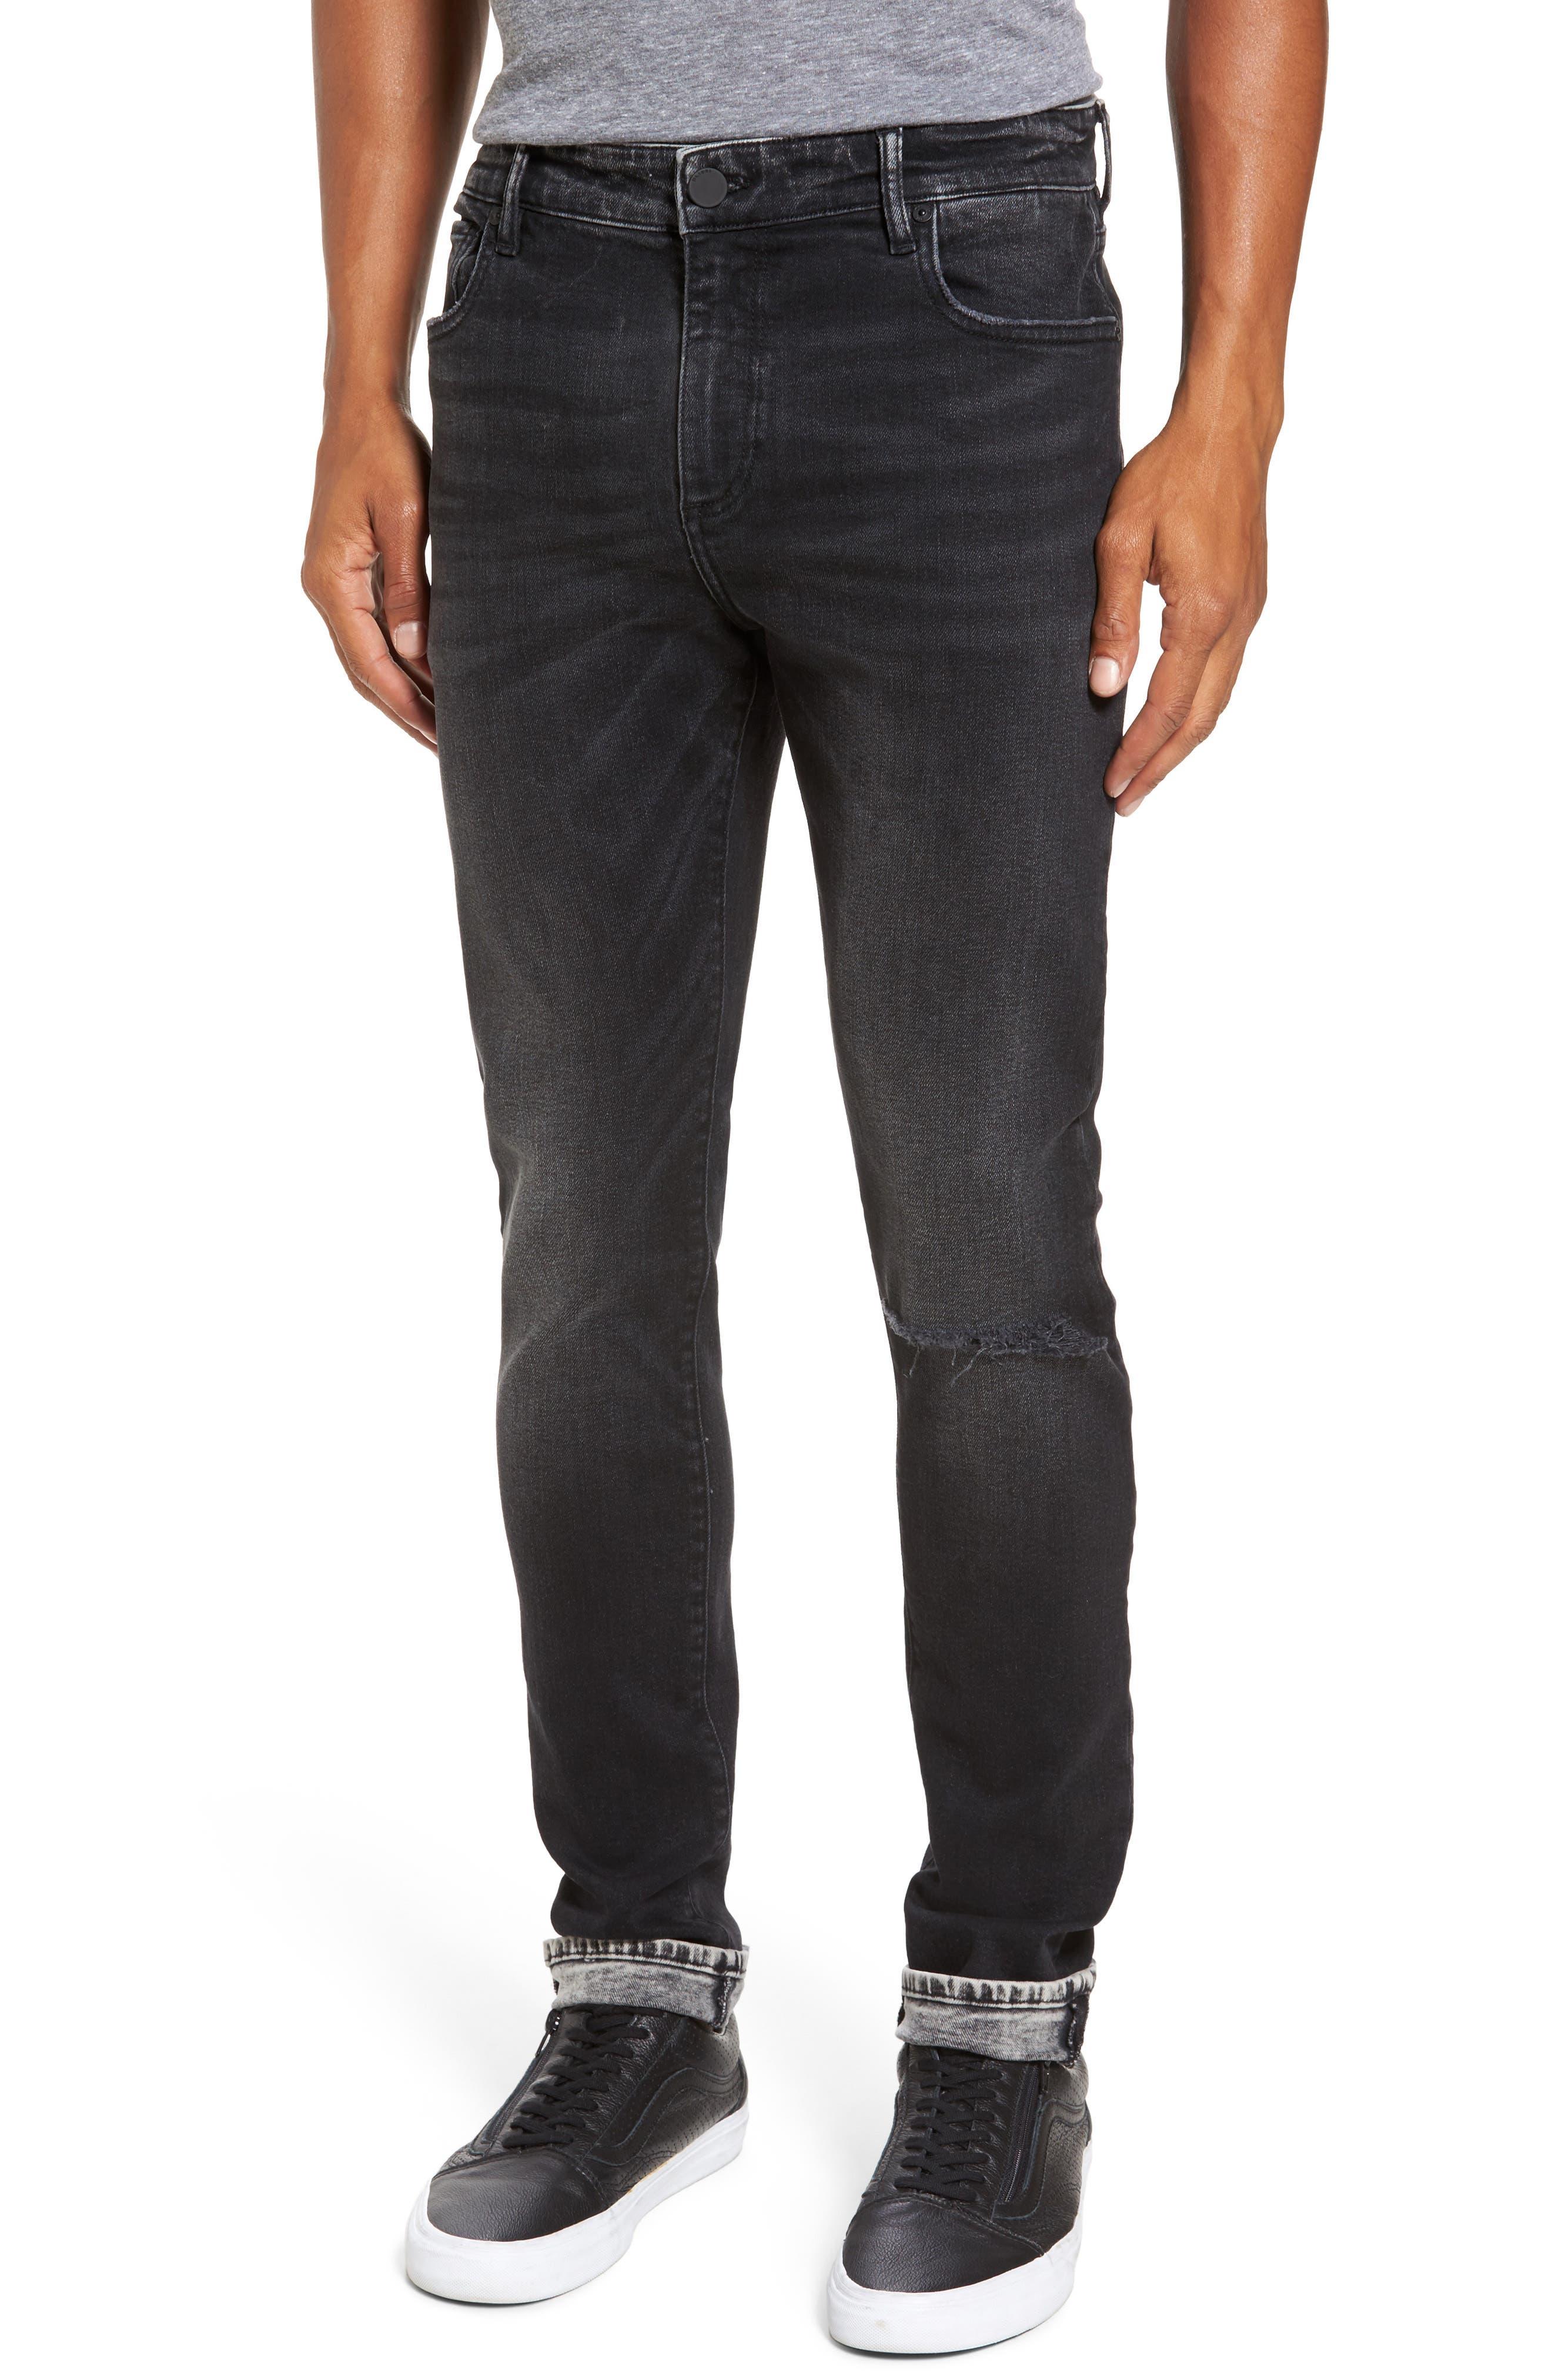 Main Image - DL1961 Hunter Skinny Jeans (Argon)